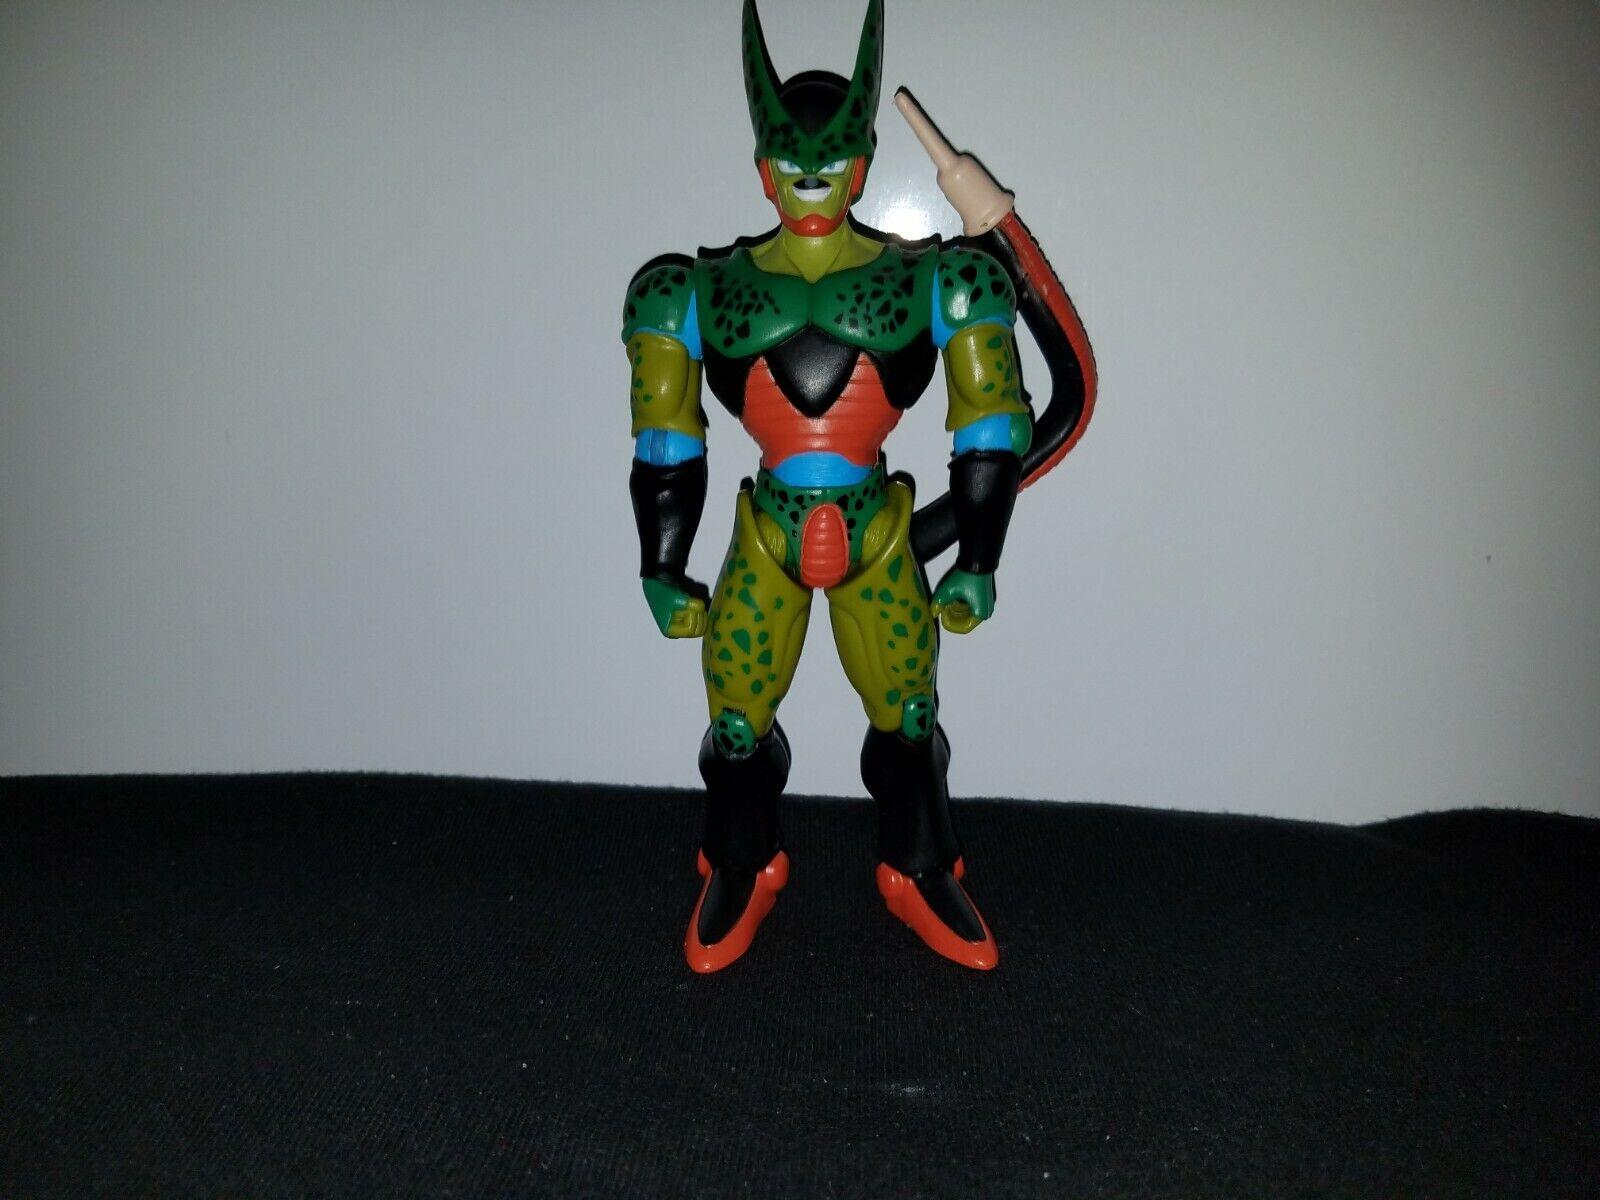 Dragon Ball Z DBZ GT Irwin JAKKS Semi Perfect Cell 2nd Form 2003 Action Figure